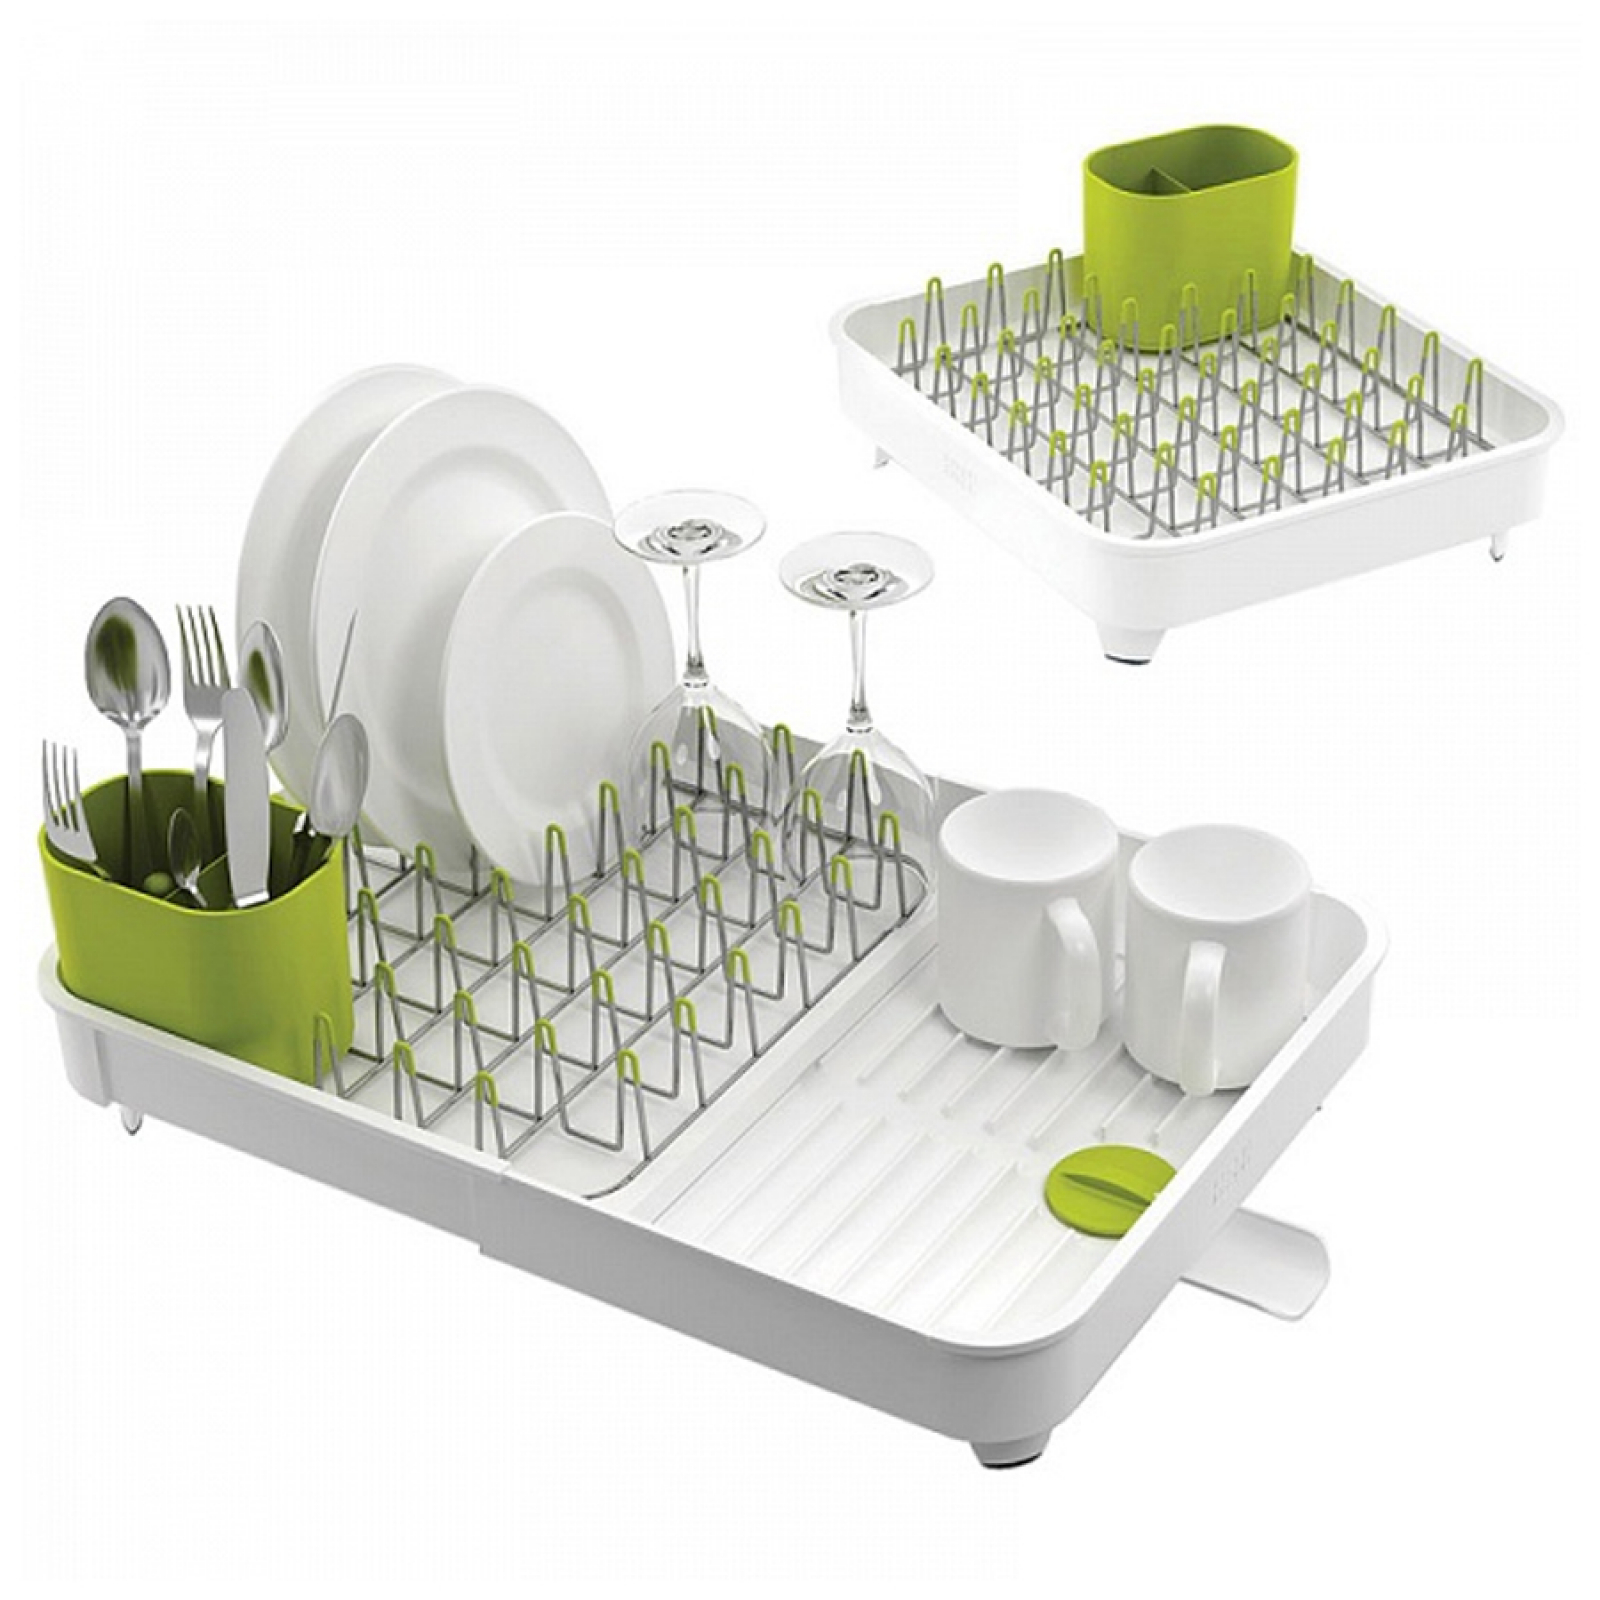 Сушилка для посуды раздвижная Joseph Joseph extend, 32х16х36 см, белый Joseph Joseph 85071 фото 2